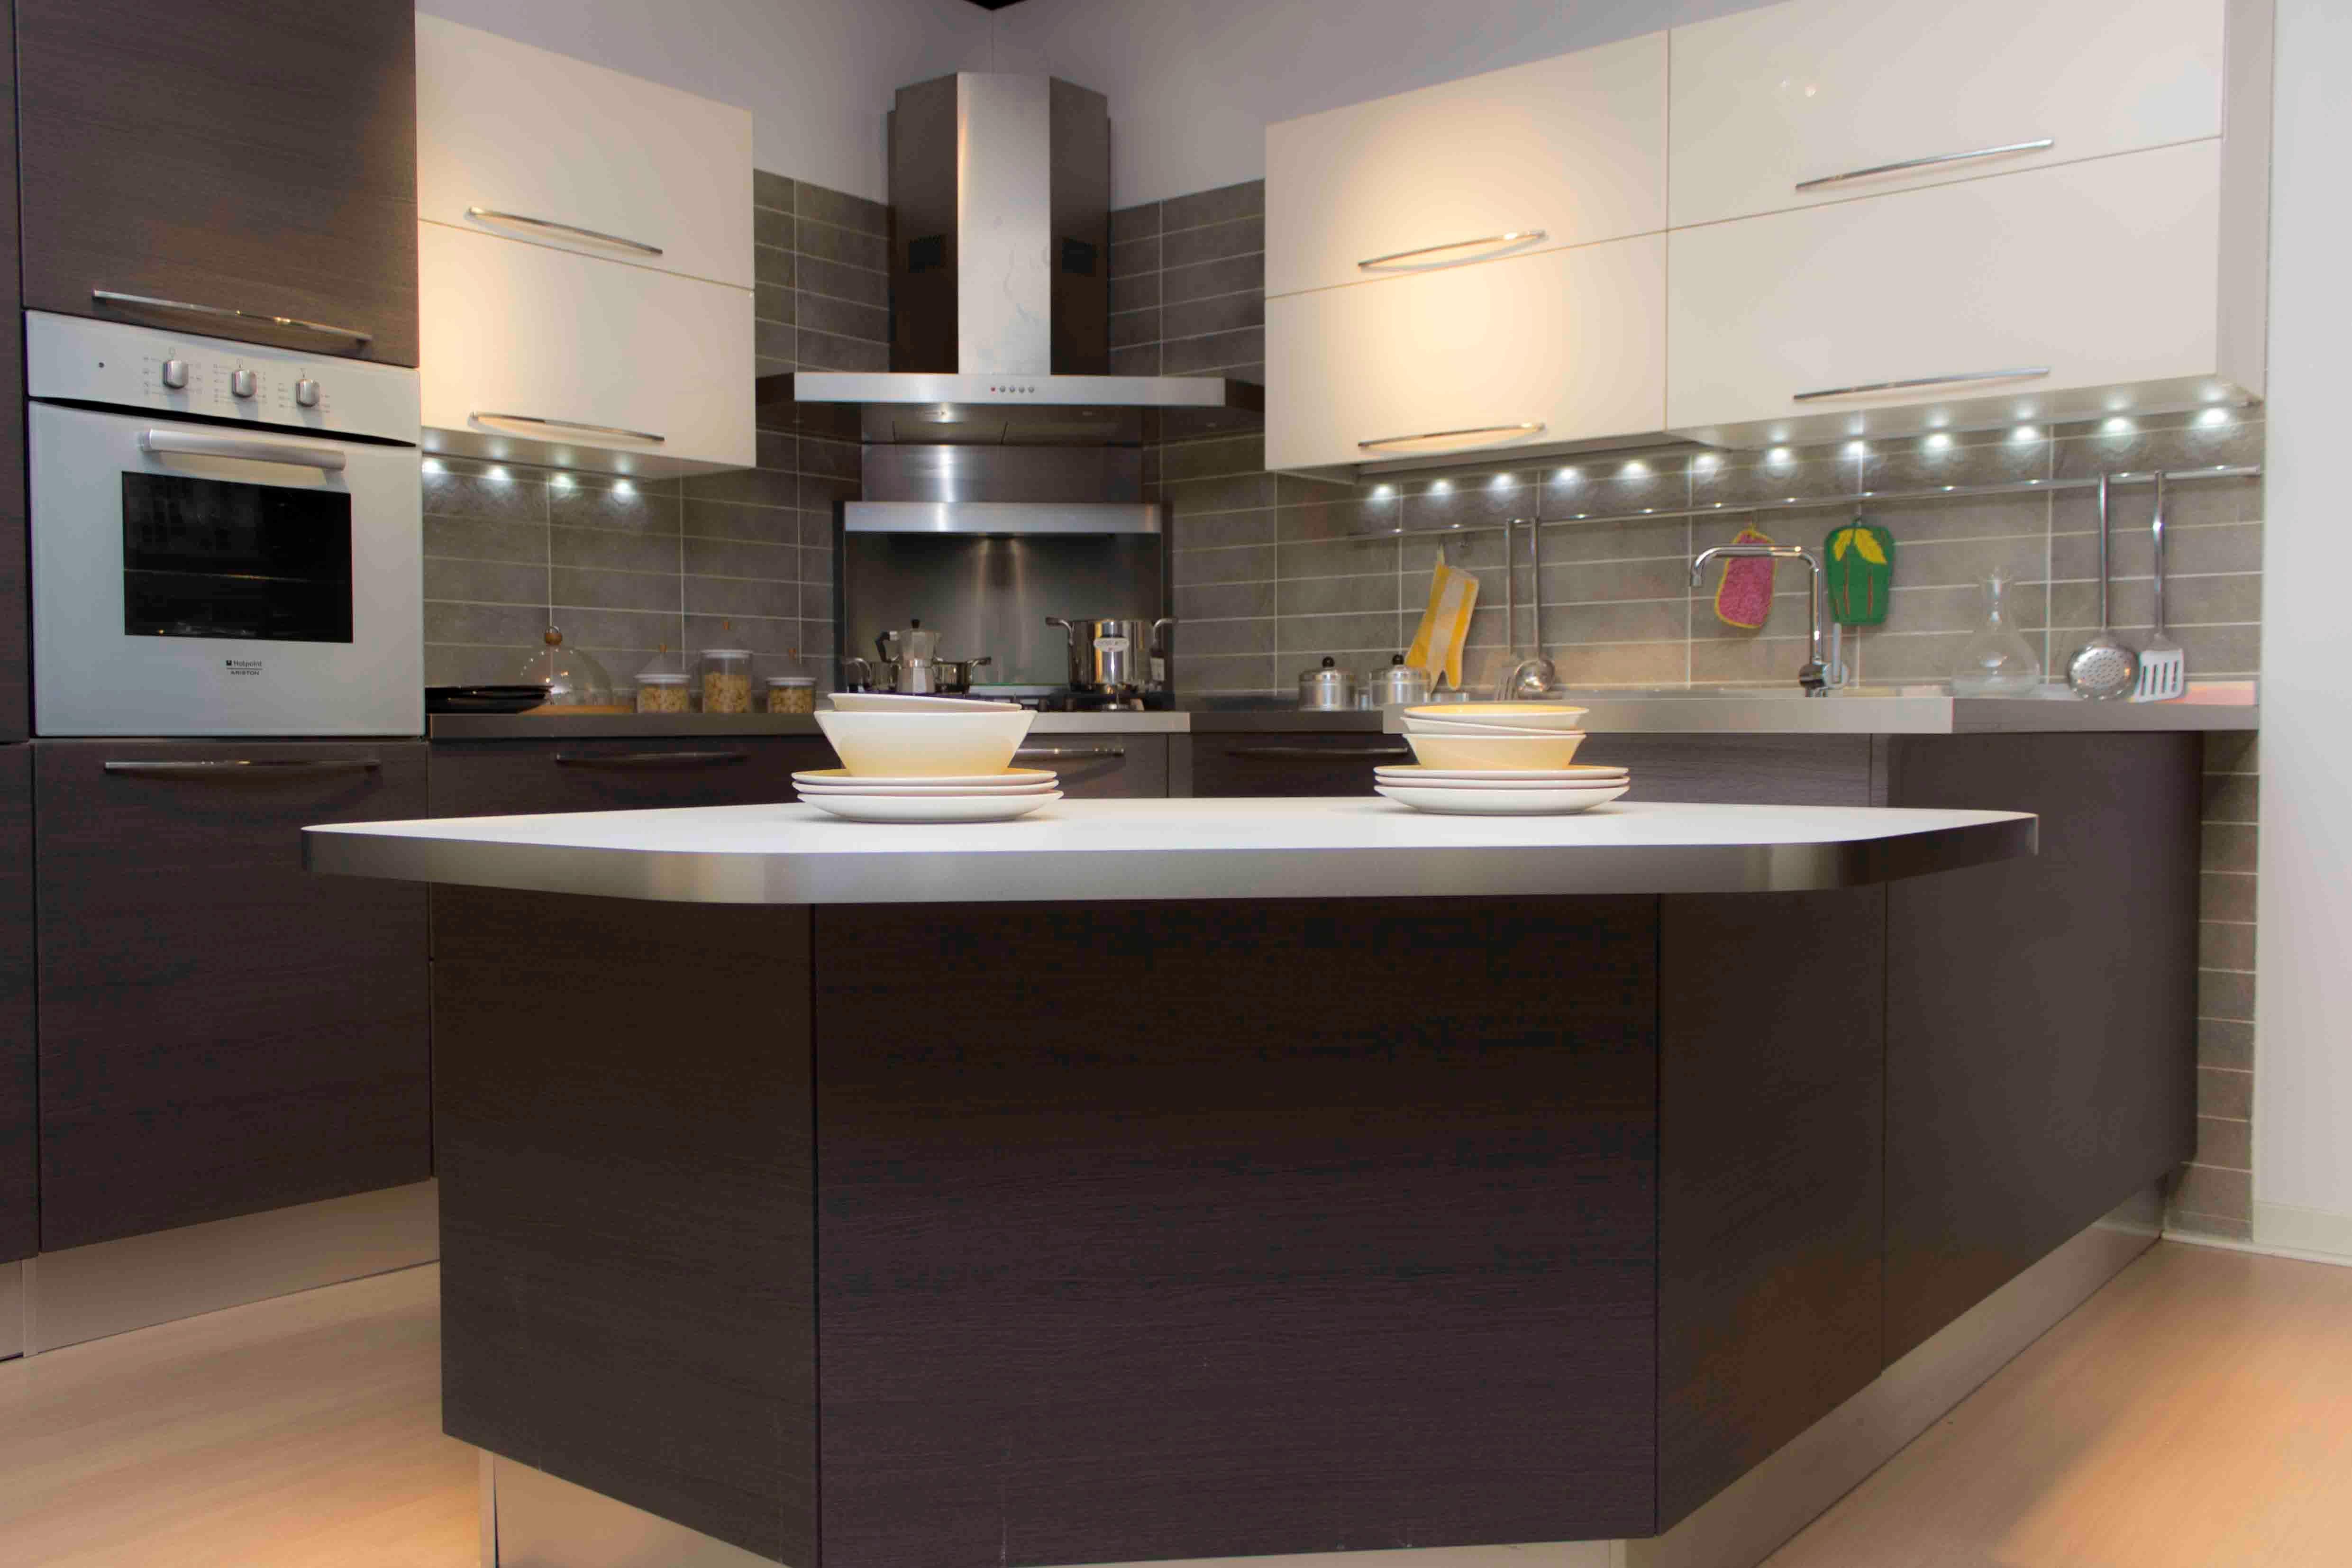 Best Cucina Carrera Veneta Cucine Gallery - Home Interior Ideas ...